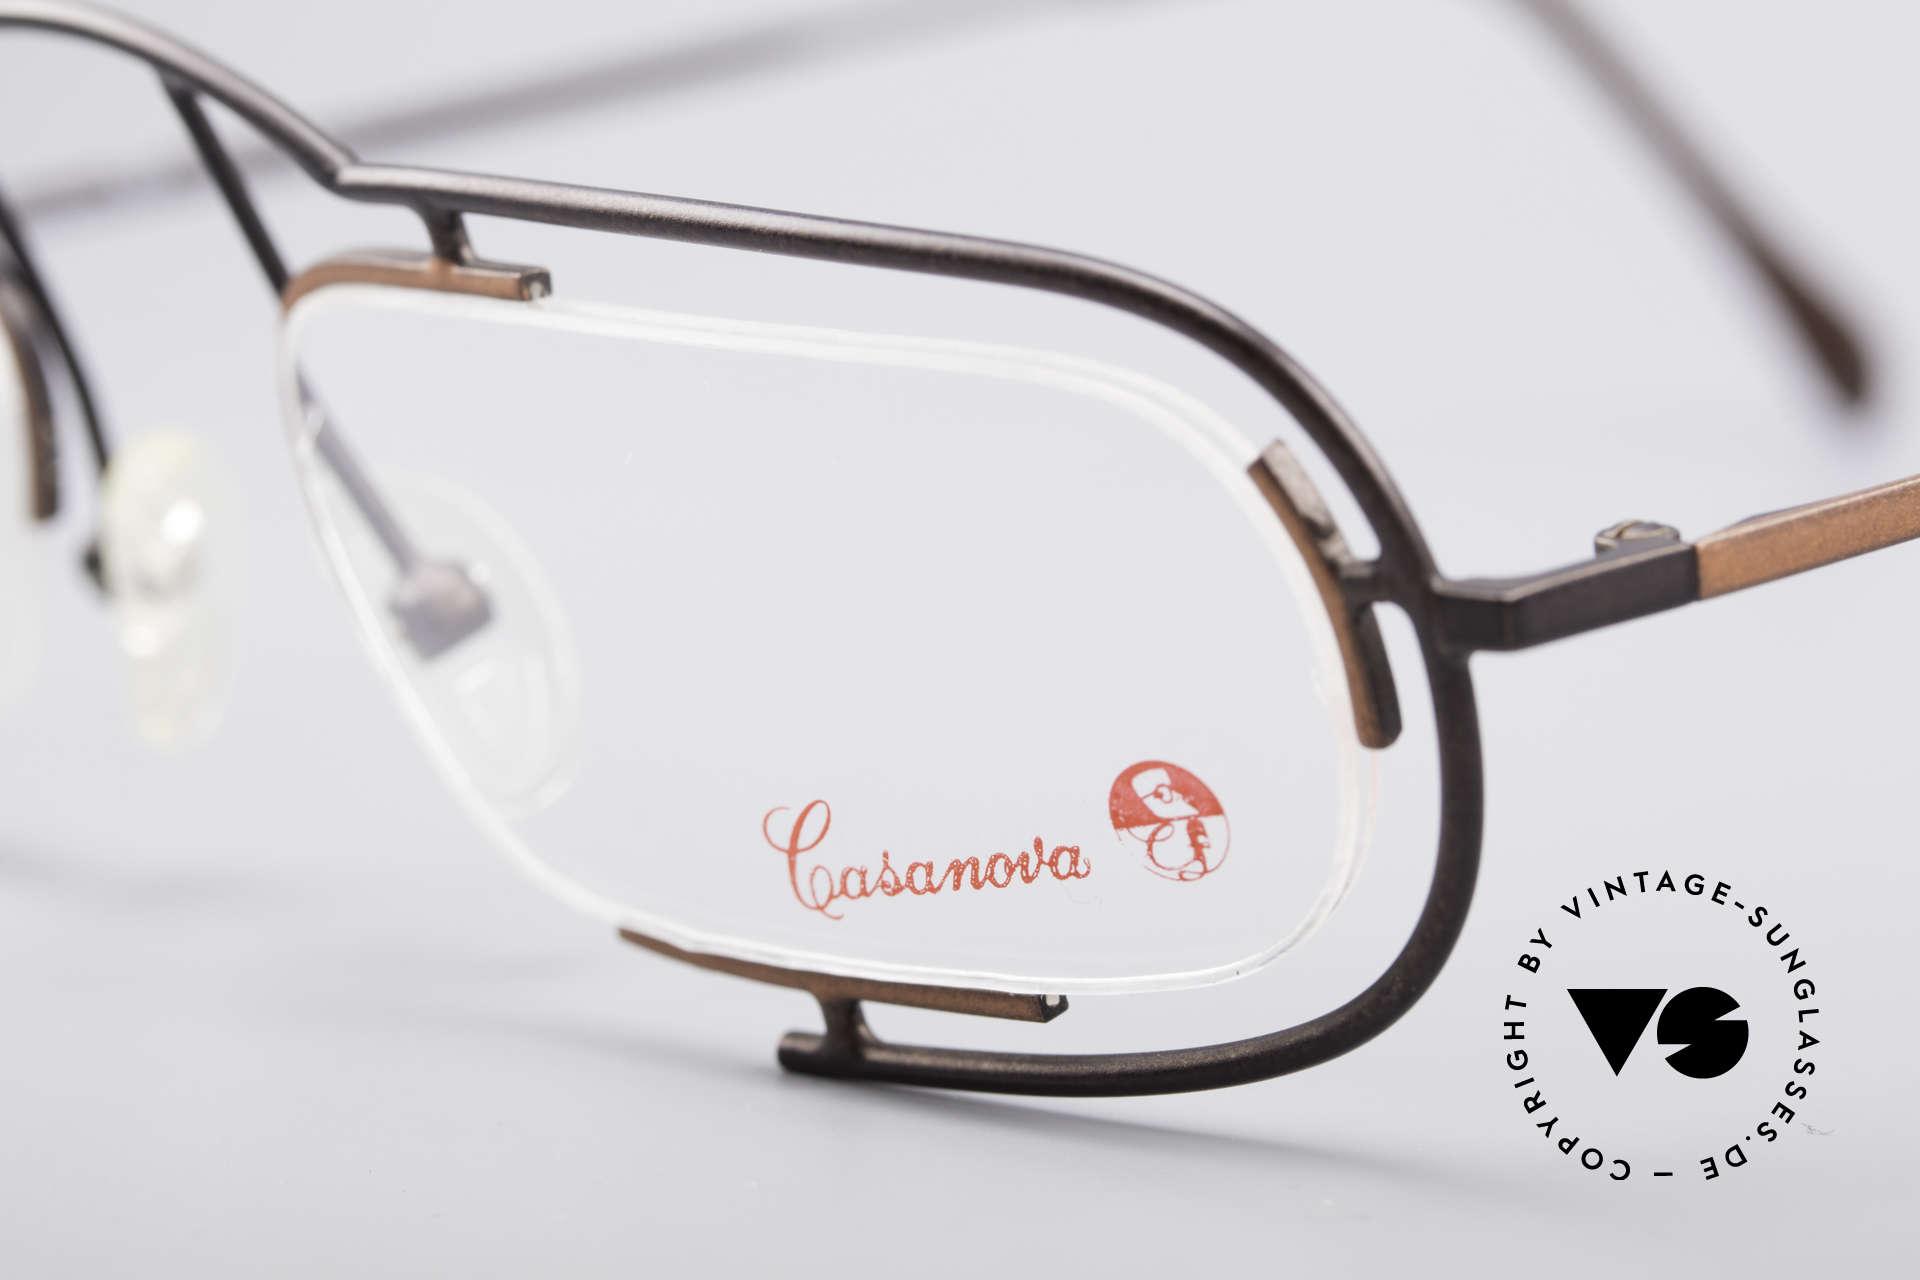 Casanova Clayberg Rare Vintage Eyglass Frame, unworn (like all our rare vintage designer frames), Made for Men and Women